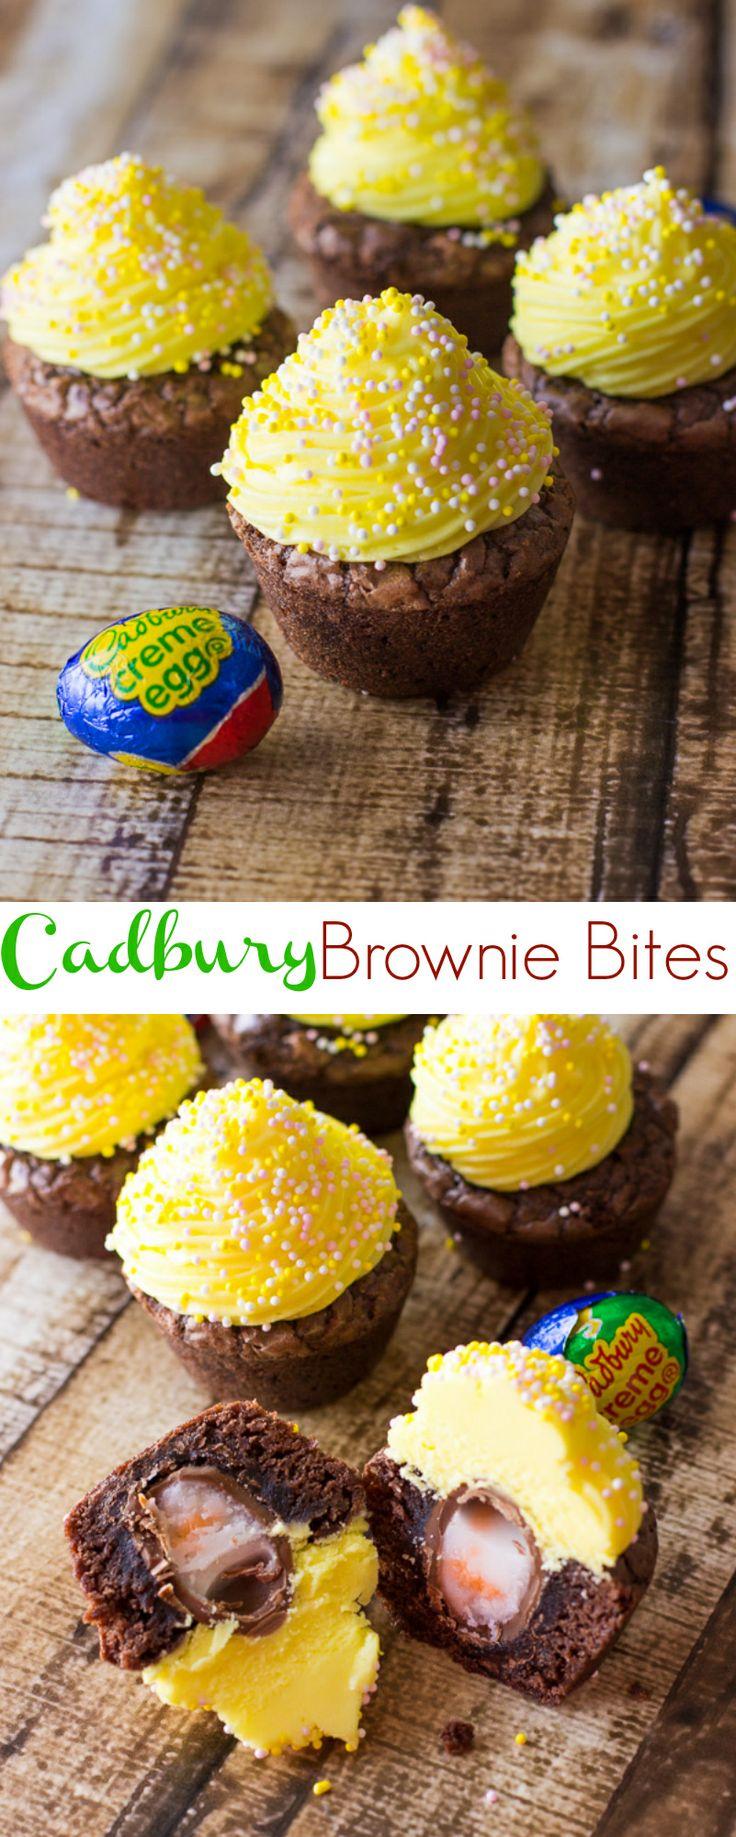 Cadbury Creme Egg Brownie Bites at deliciouslysprinkled.com